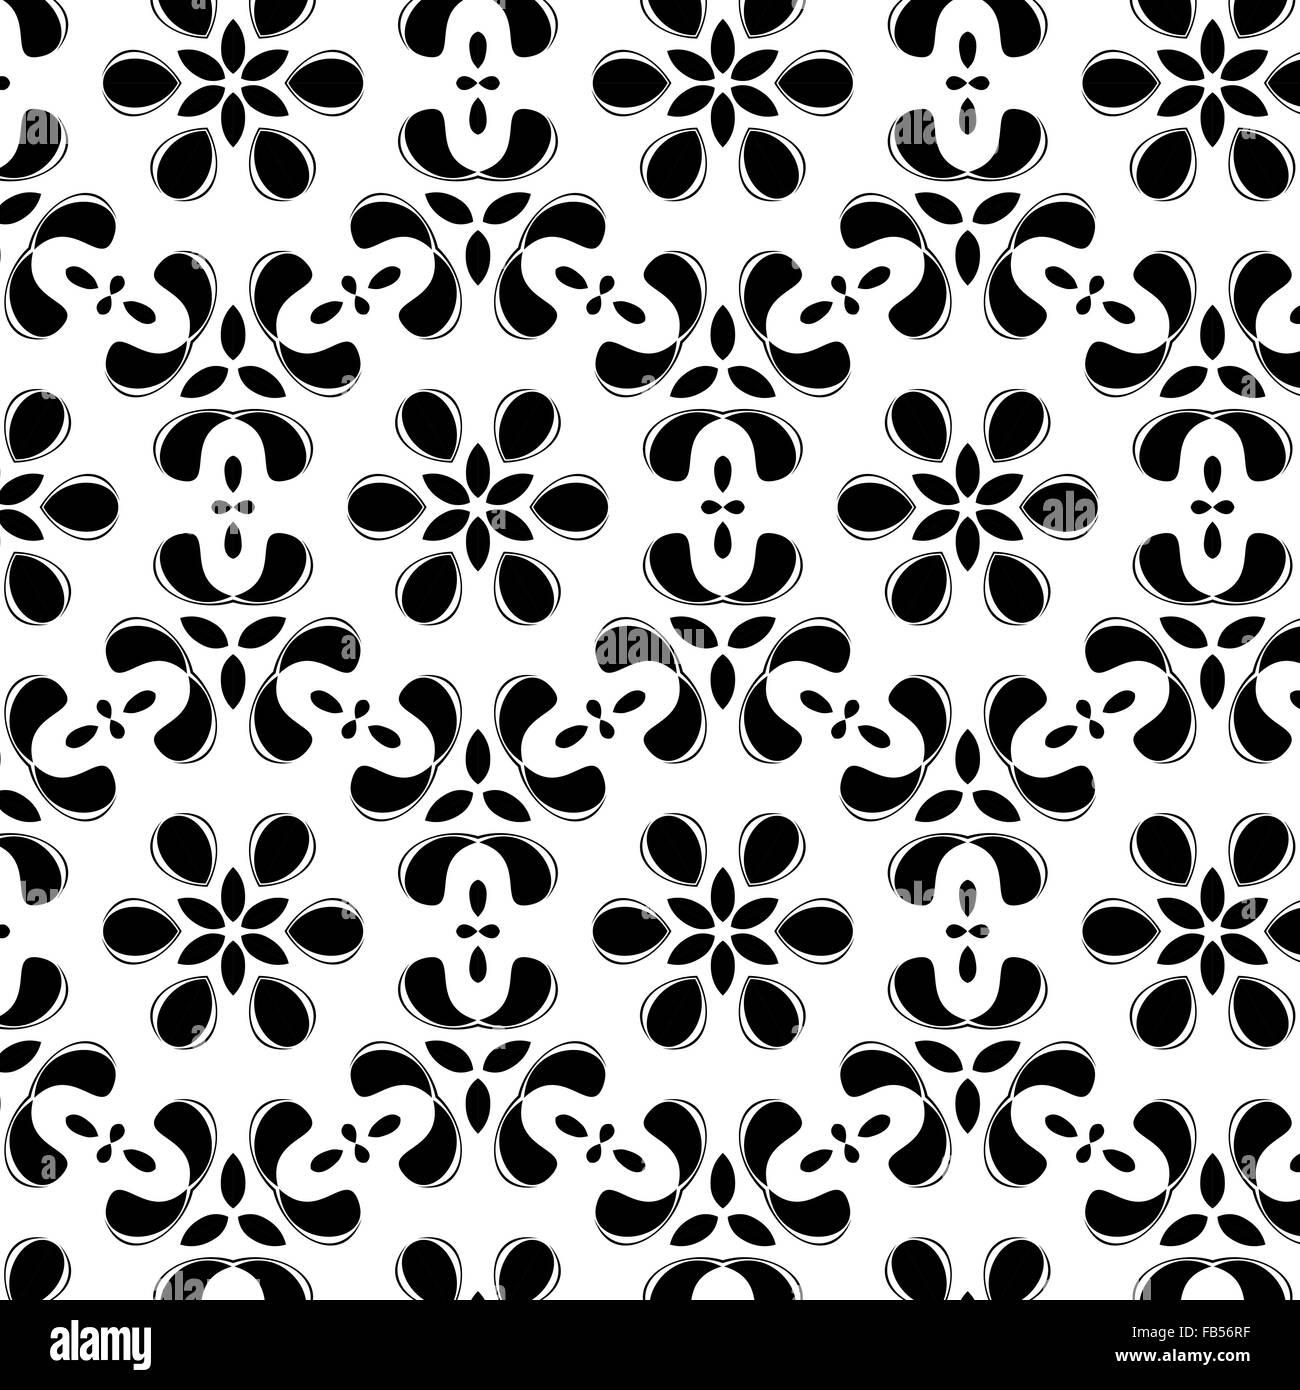 Primitive simple  grey retro pattern - Stock Image